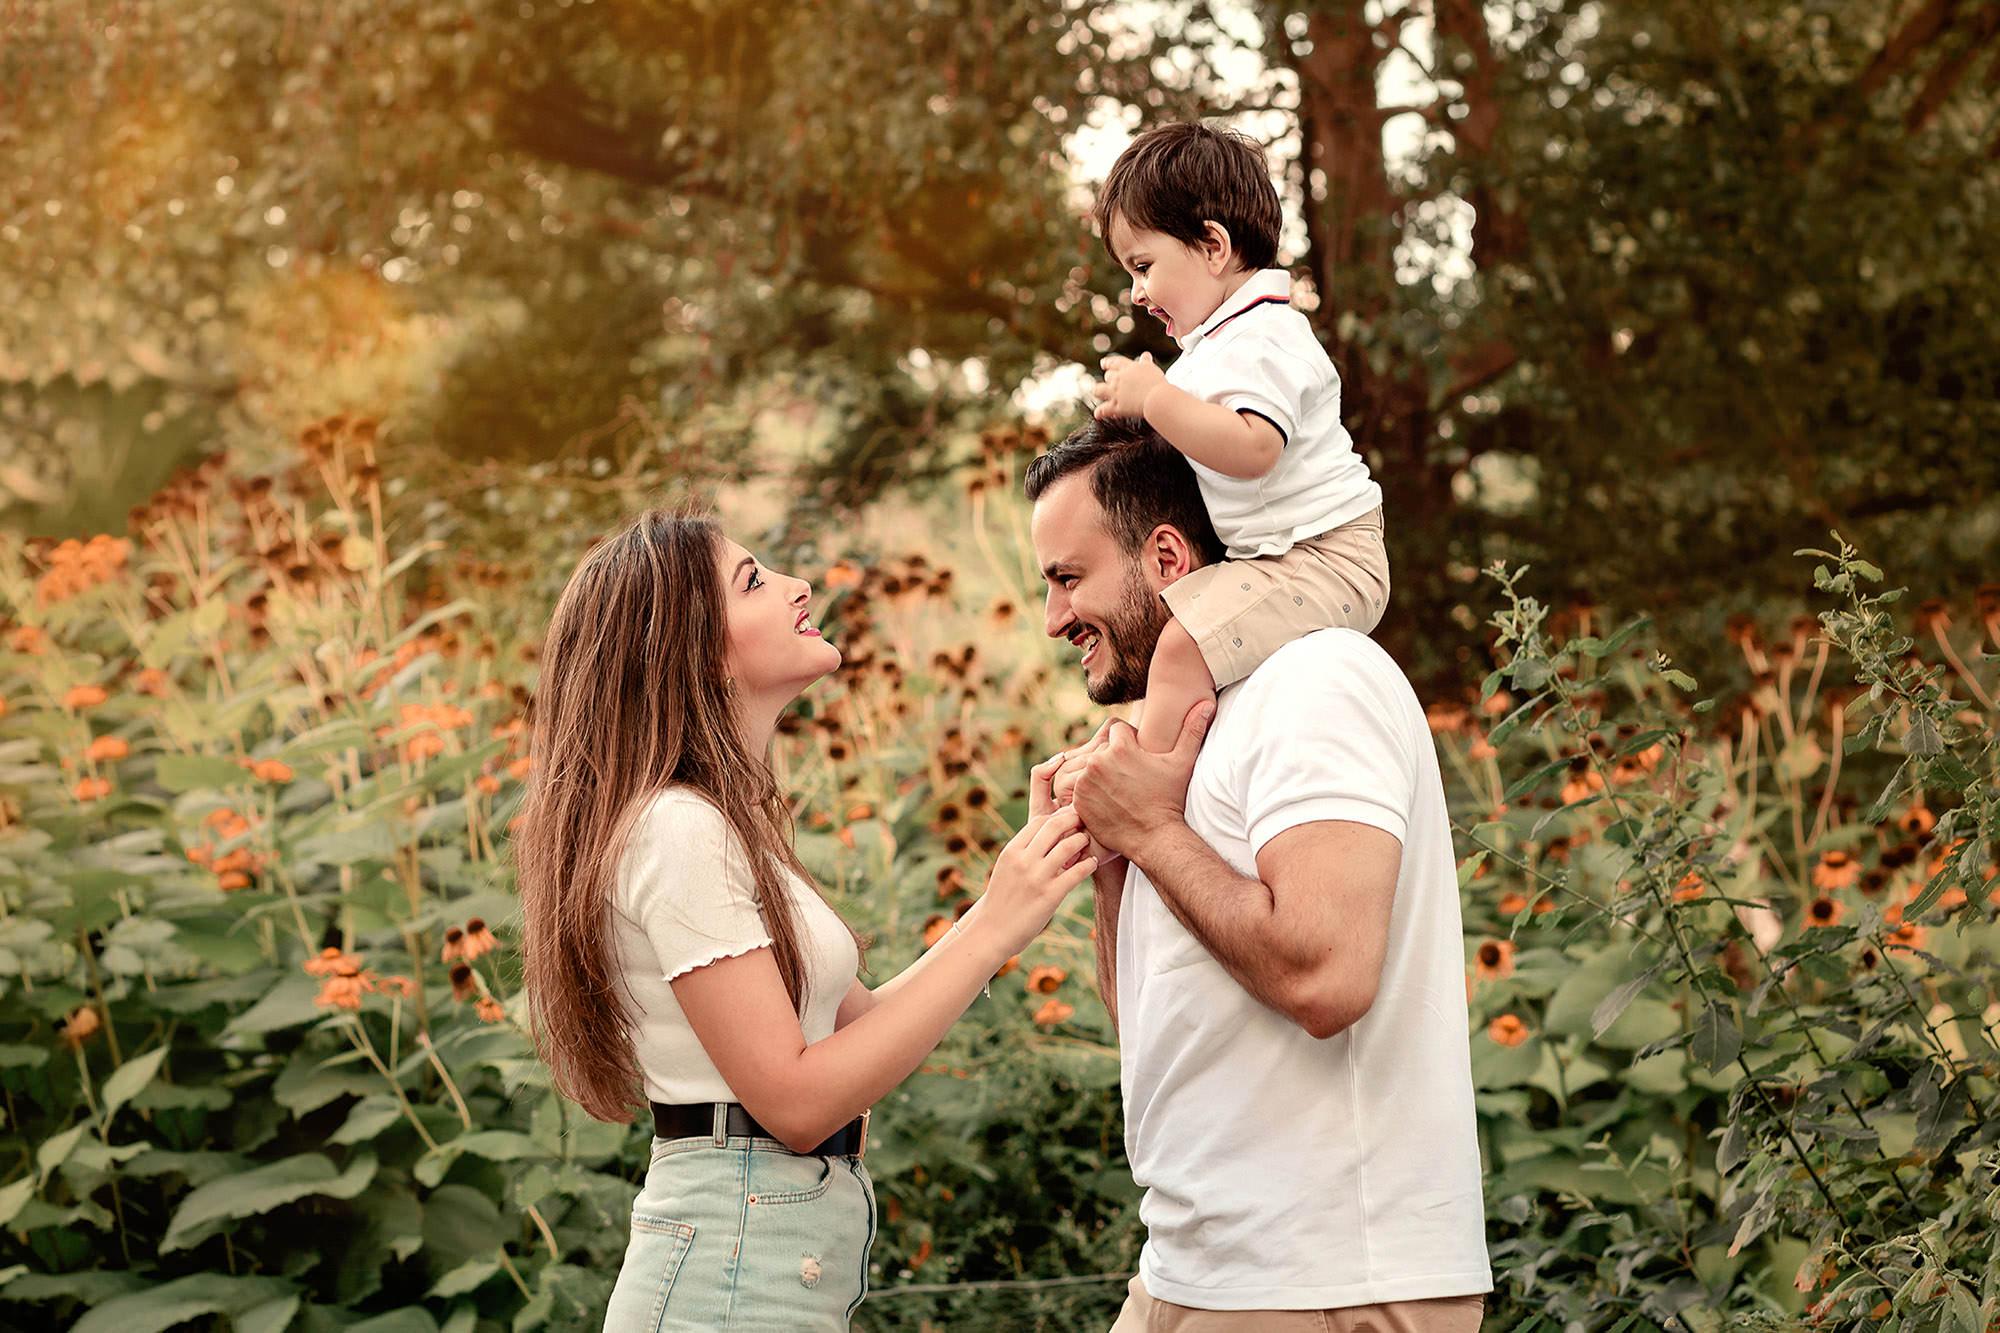 Outdoor Family Photography | Yorkshire | Skipton | Keighley | Ilkley | Bingley